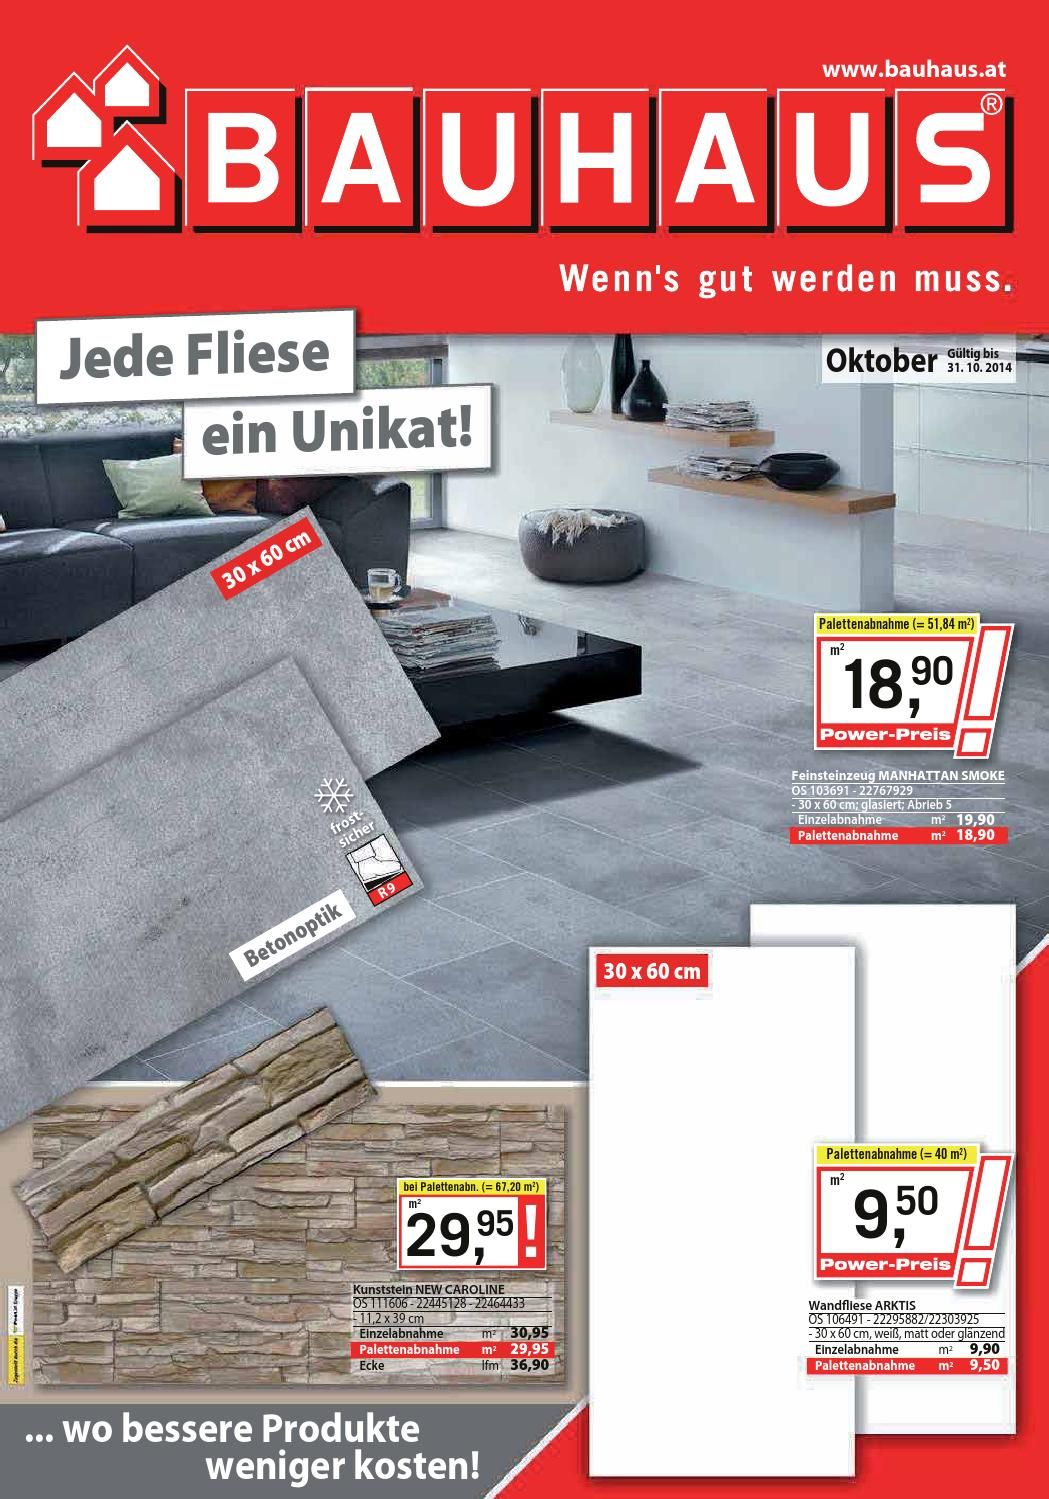 Bauhaus Angebote 1 31 Oktober 2014 By Promoangebote At Issuu